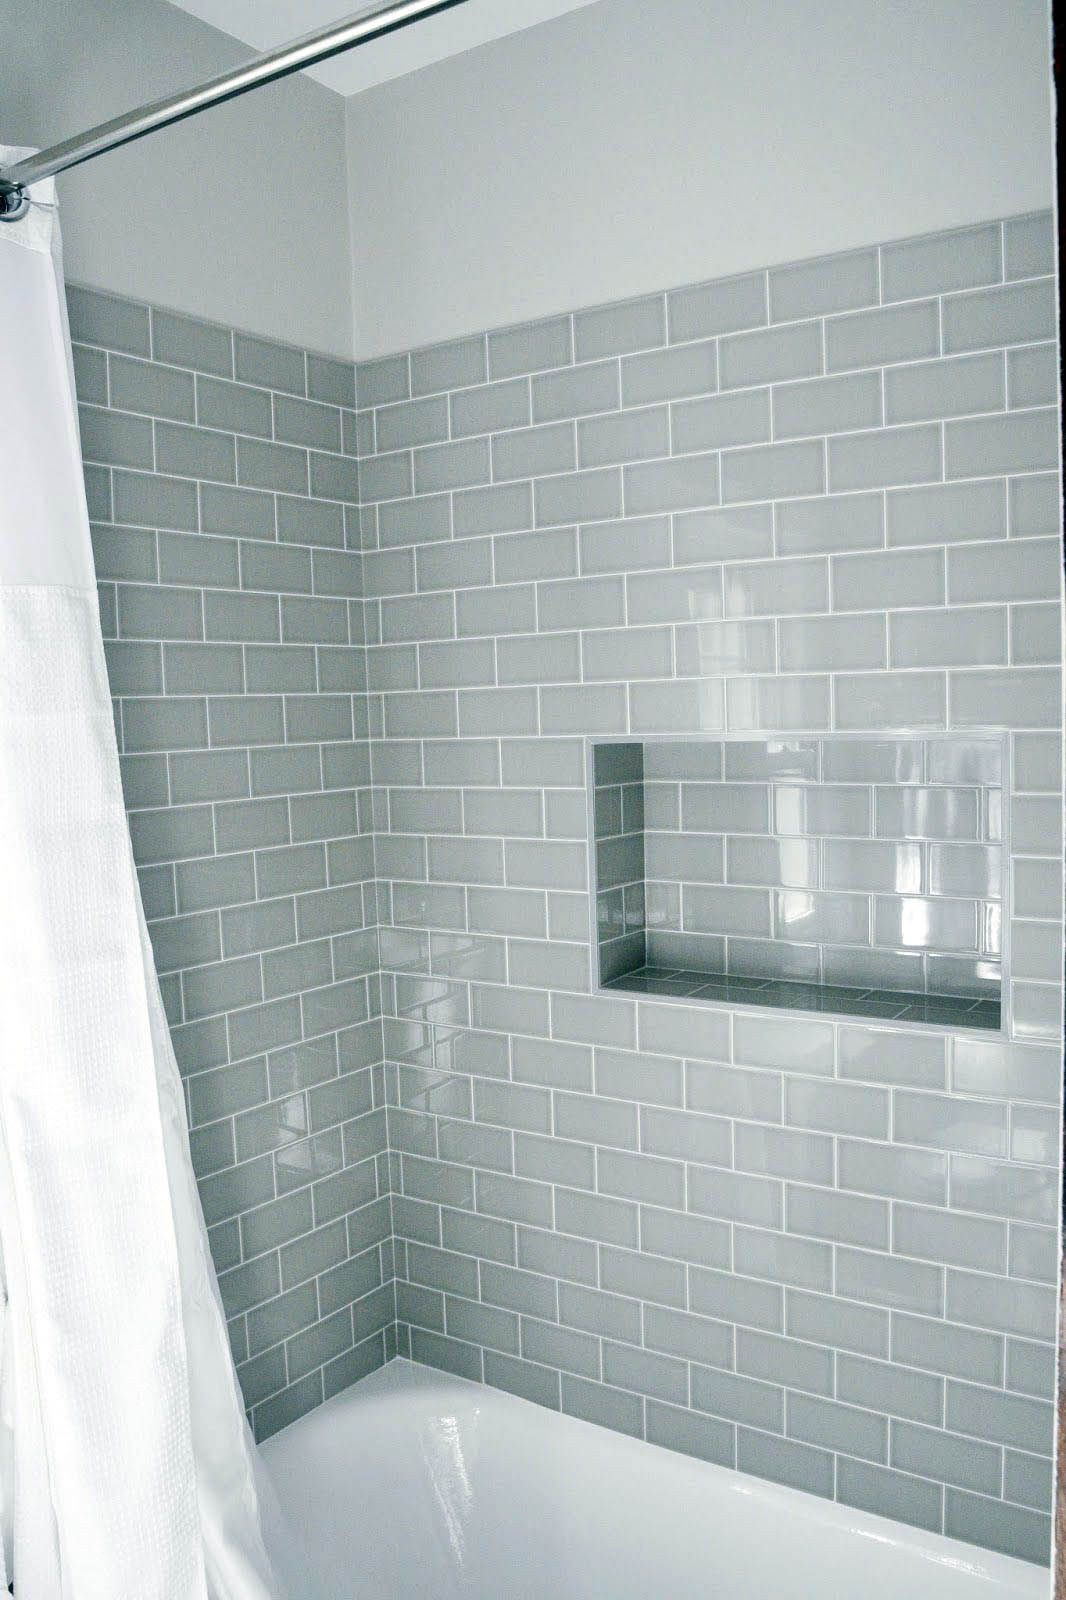 15 Of Our Favorite Shower Tile Ideas Bathrooms Remodel Bathroom Styling Bathroom Design